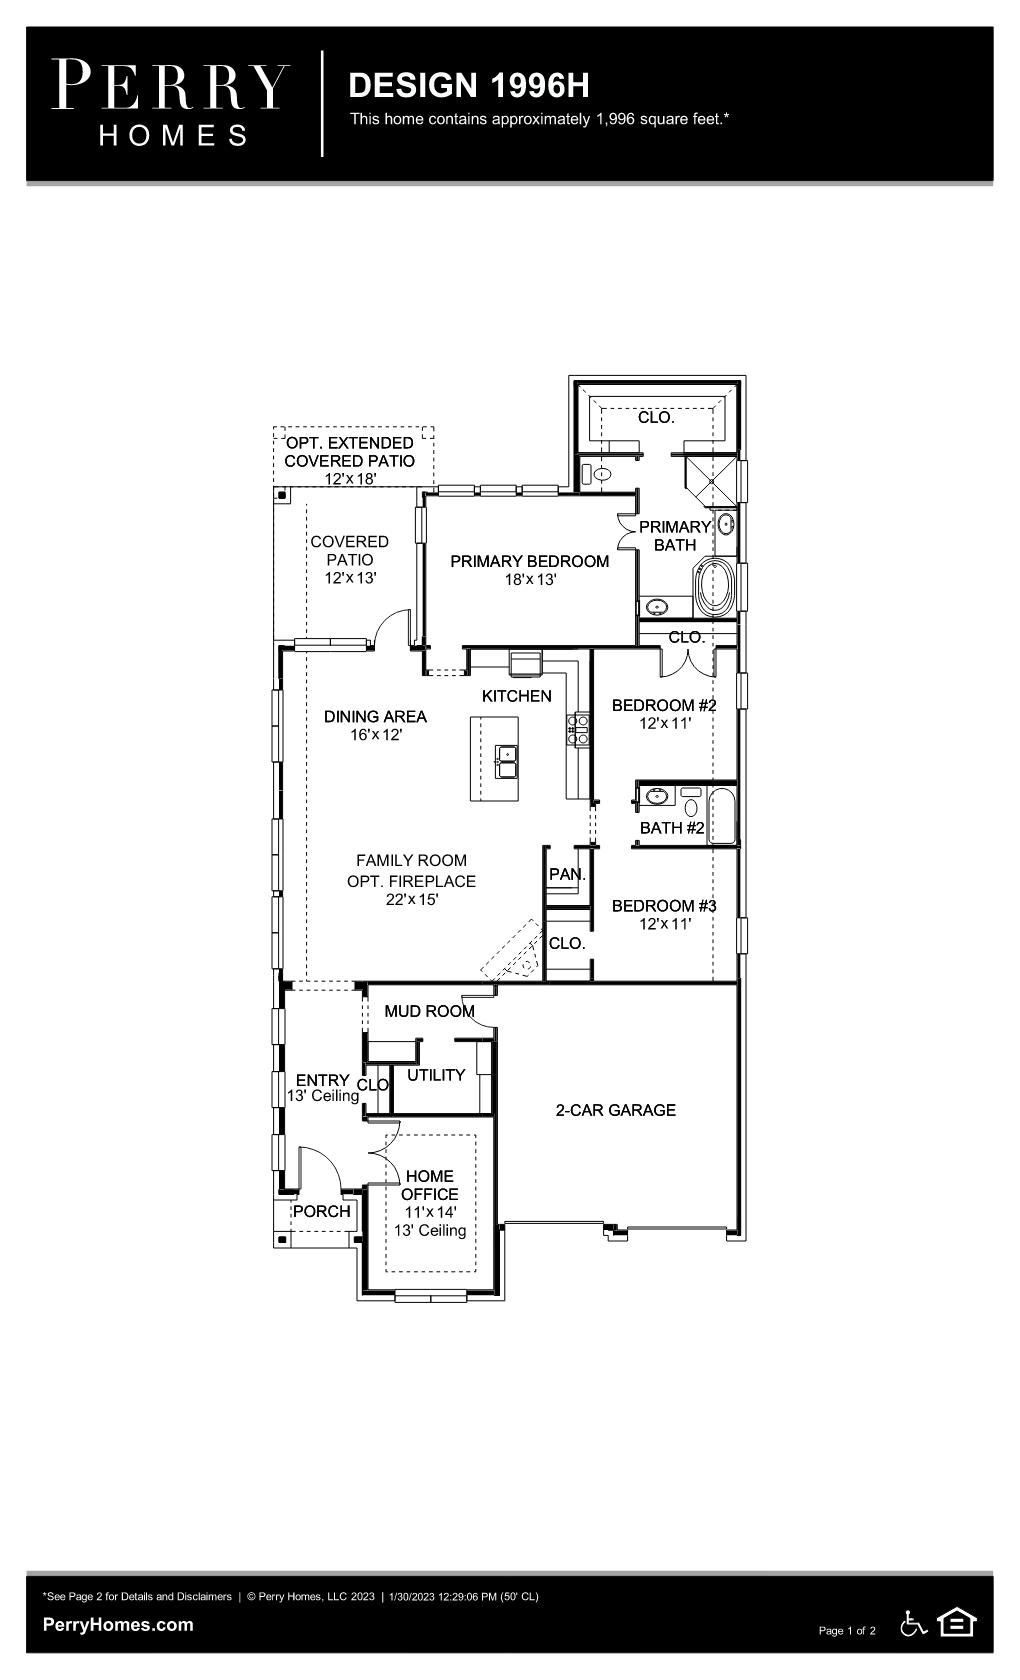 Floor Plan for 1996H